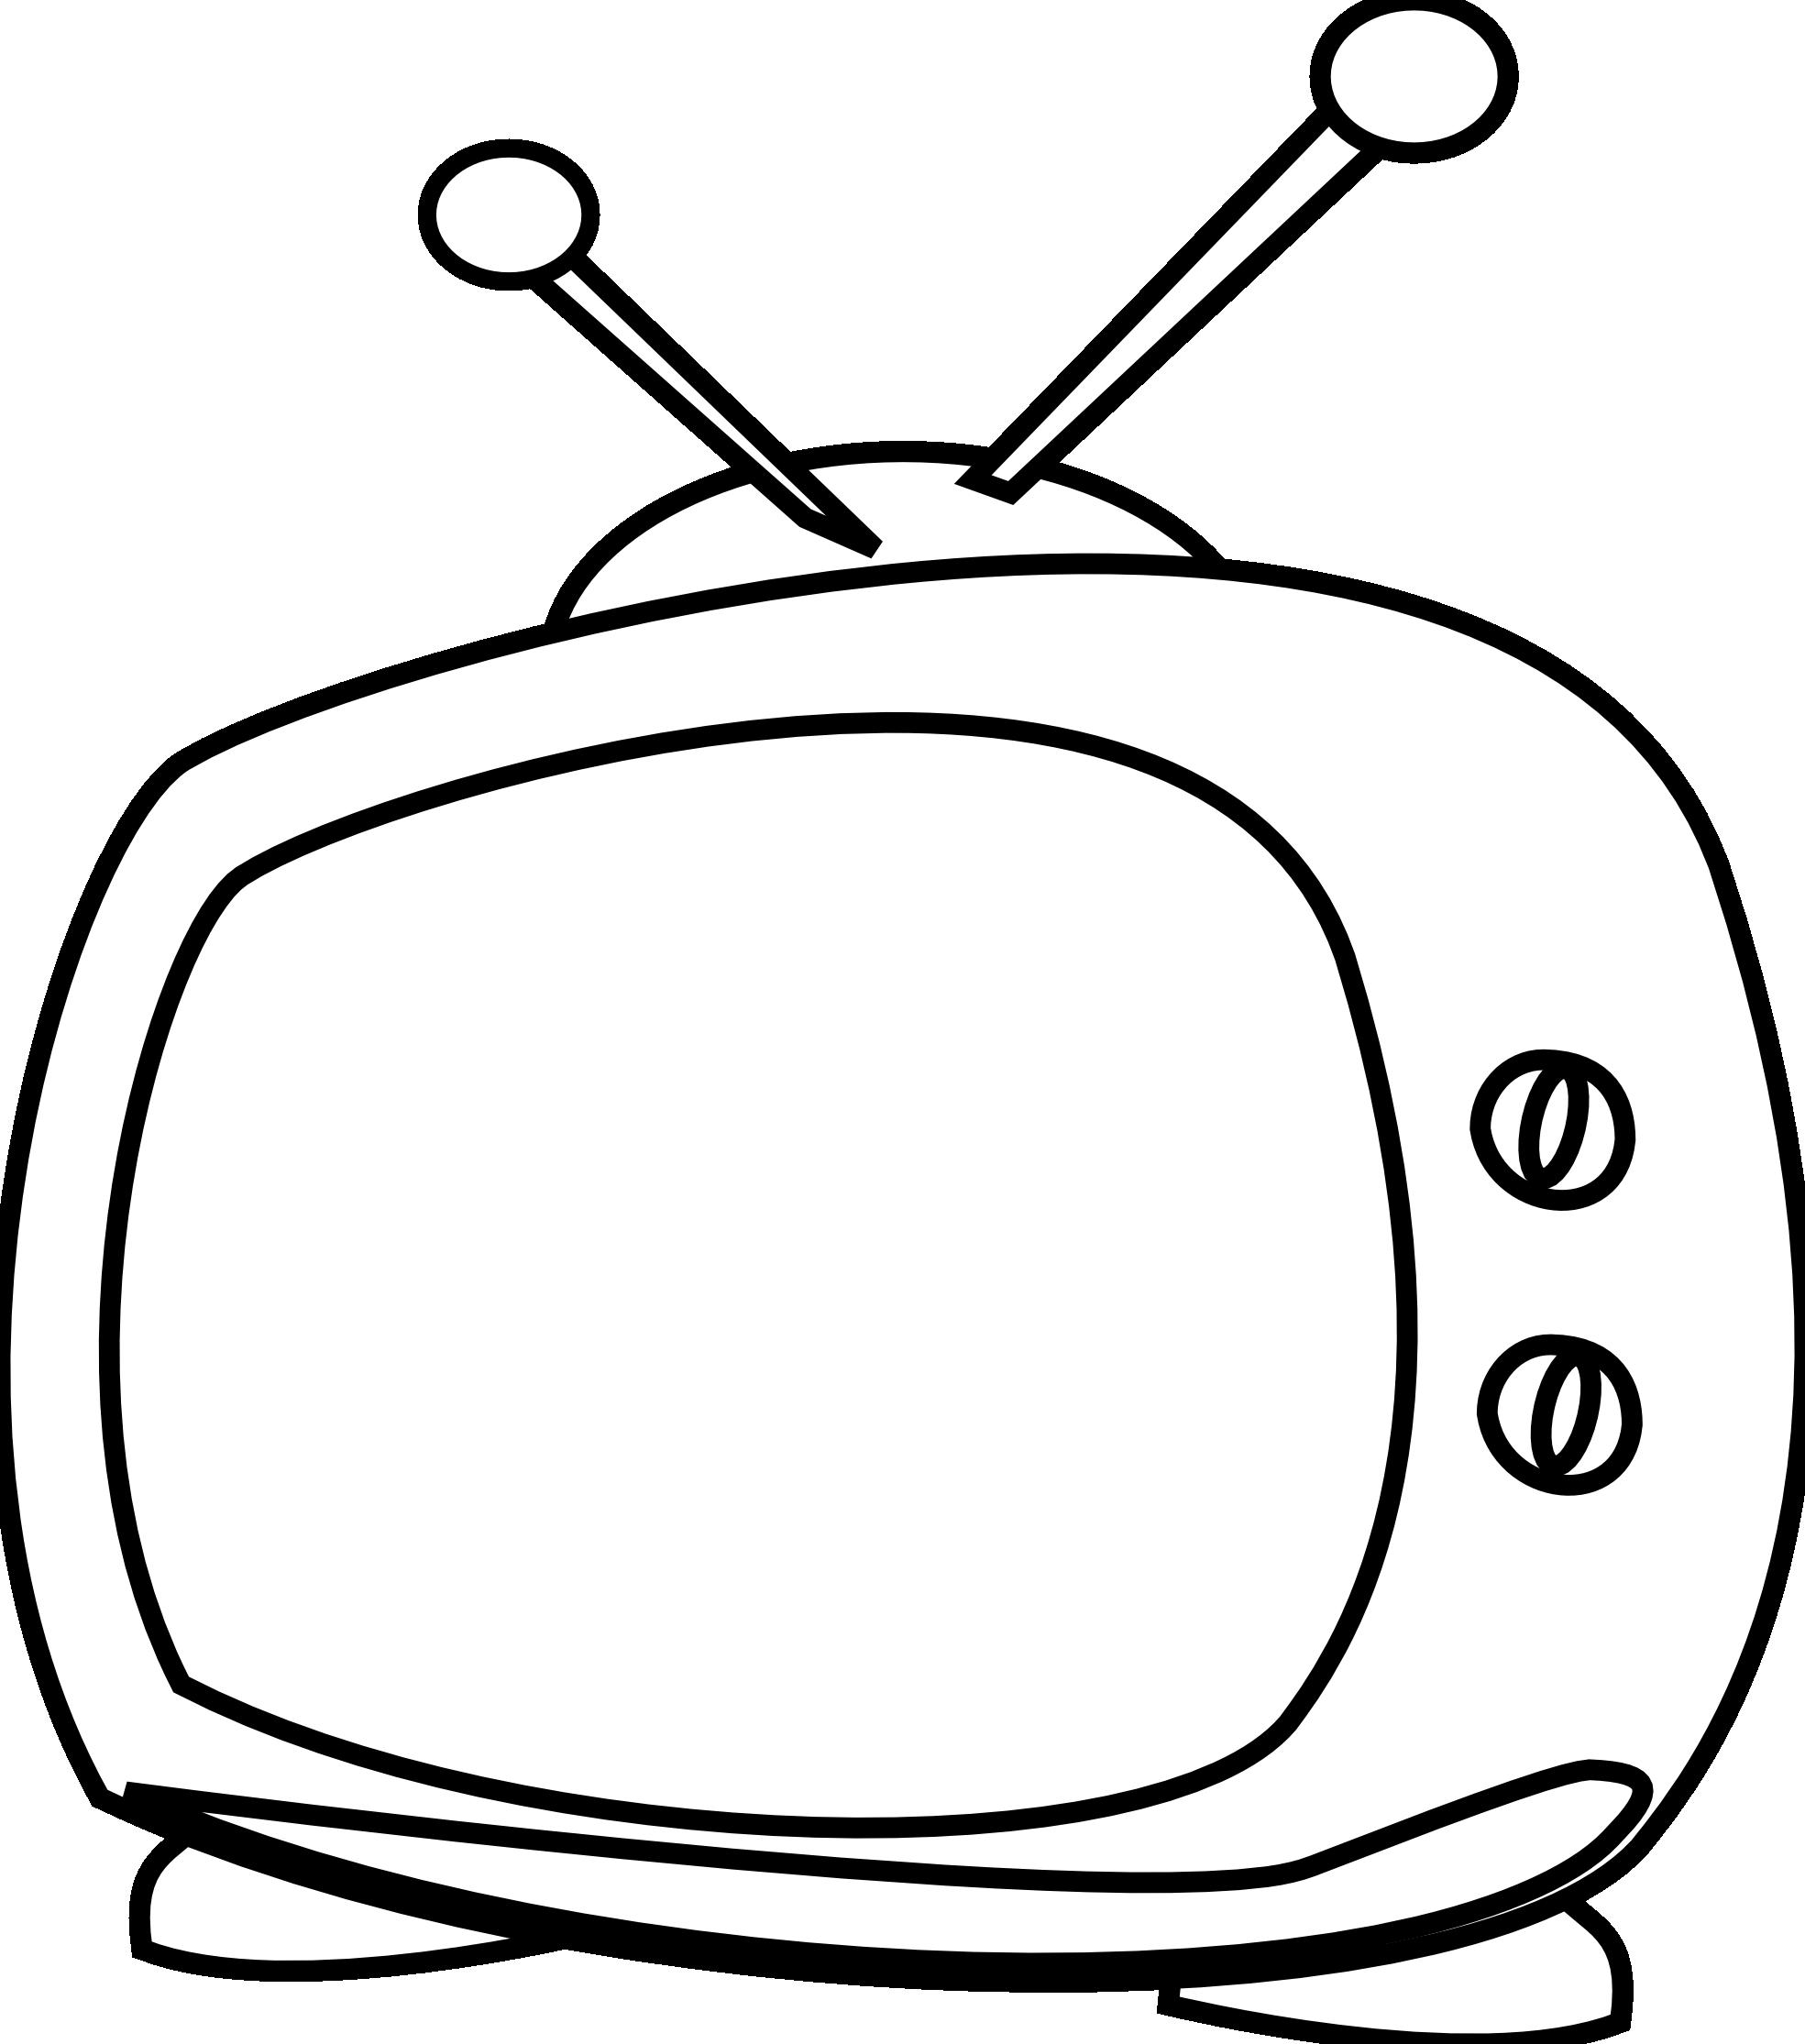 Line Art Inkscape : Tv cartoon clipart suggest